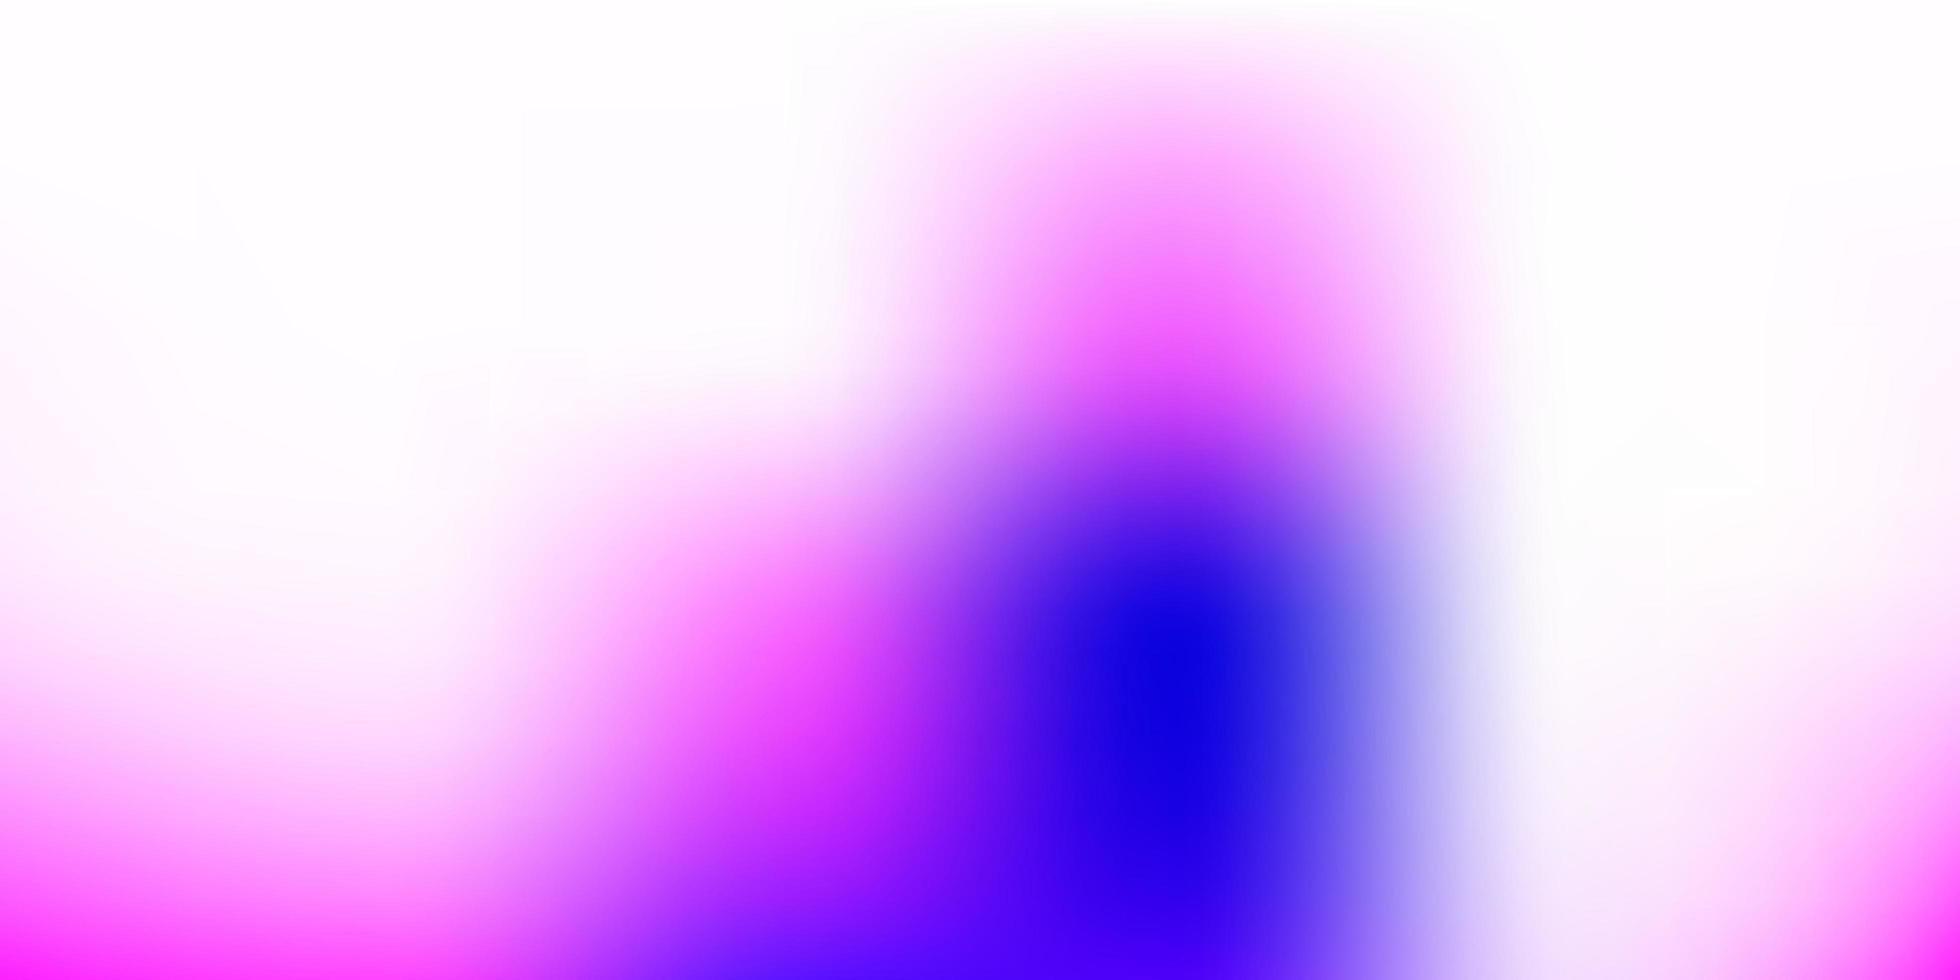 sfondo sfocato sfumato viola chiaro, rosa. vettore